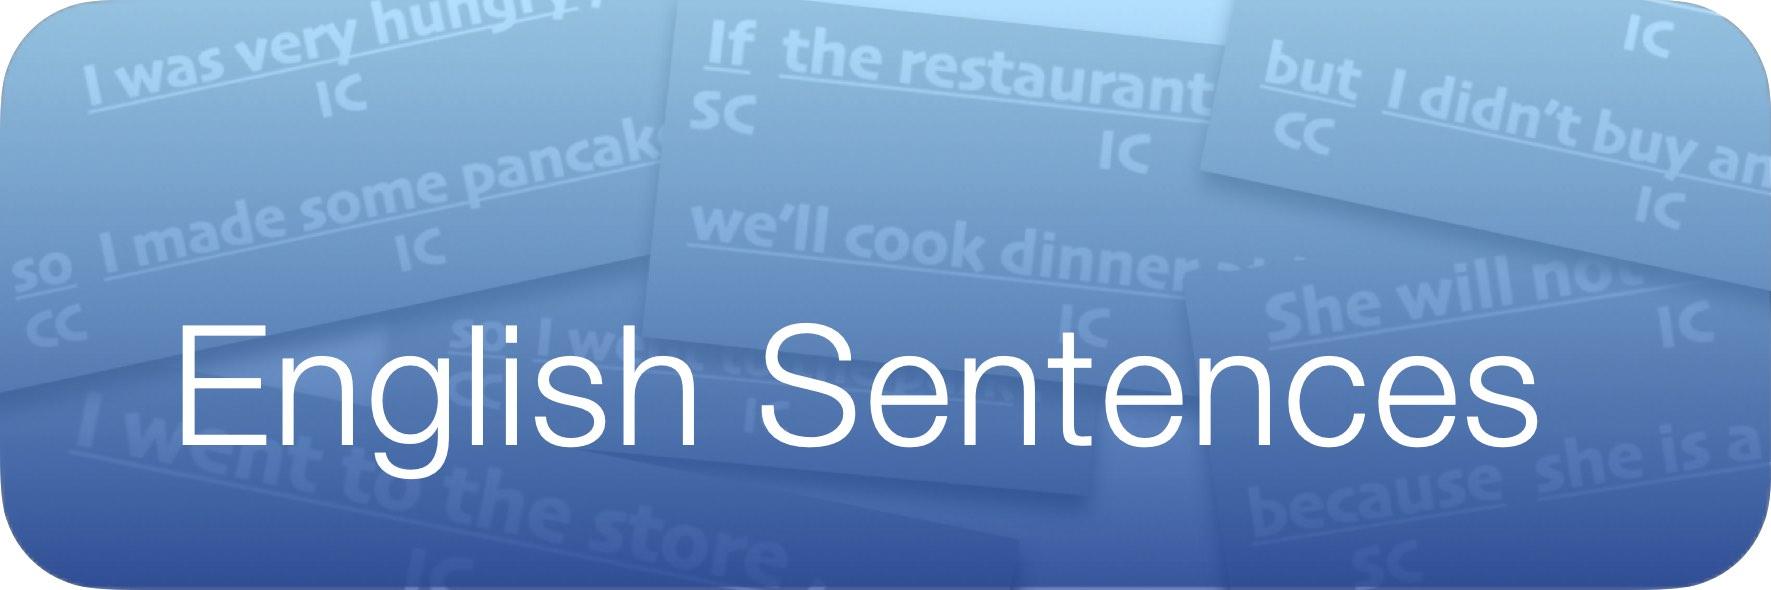 Study Button - English Sentences Blue